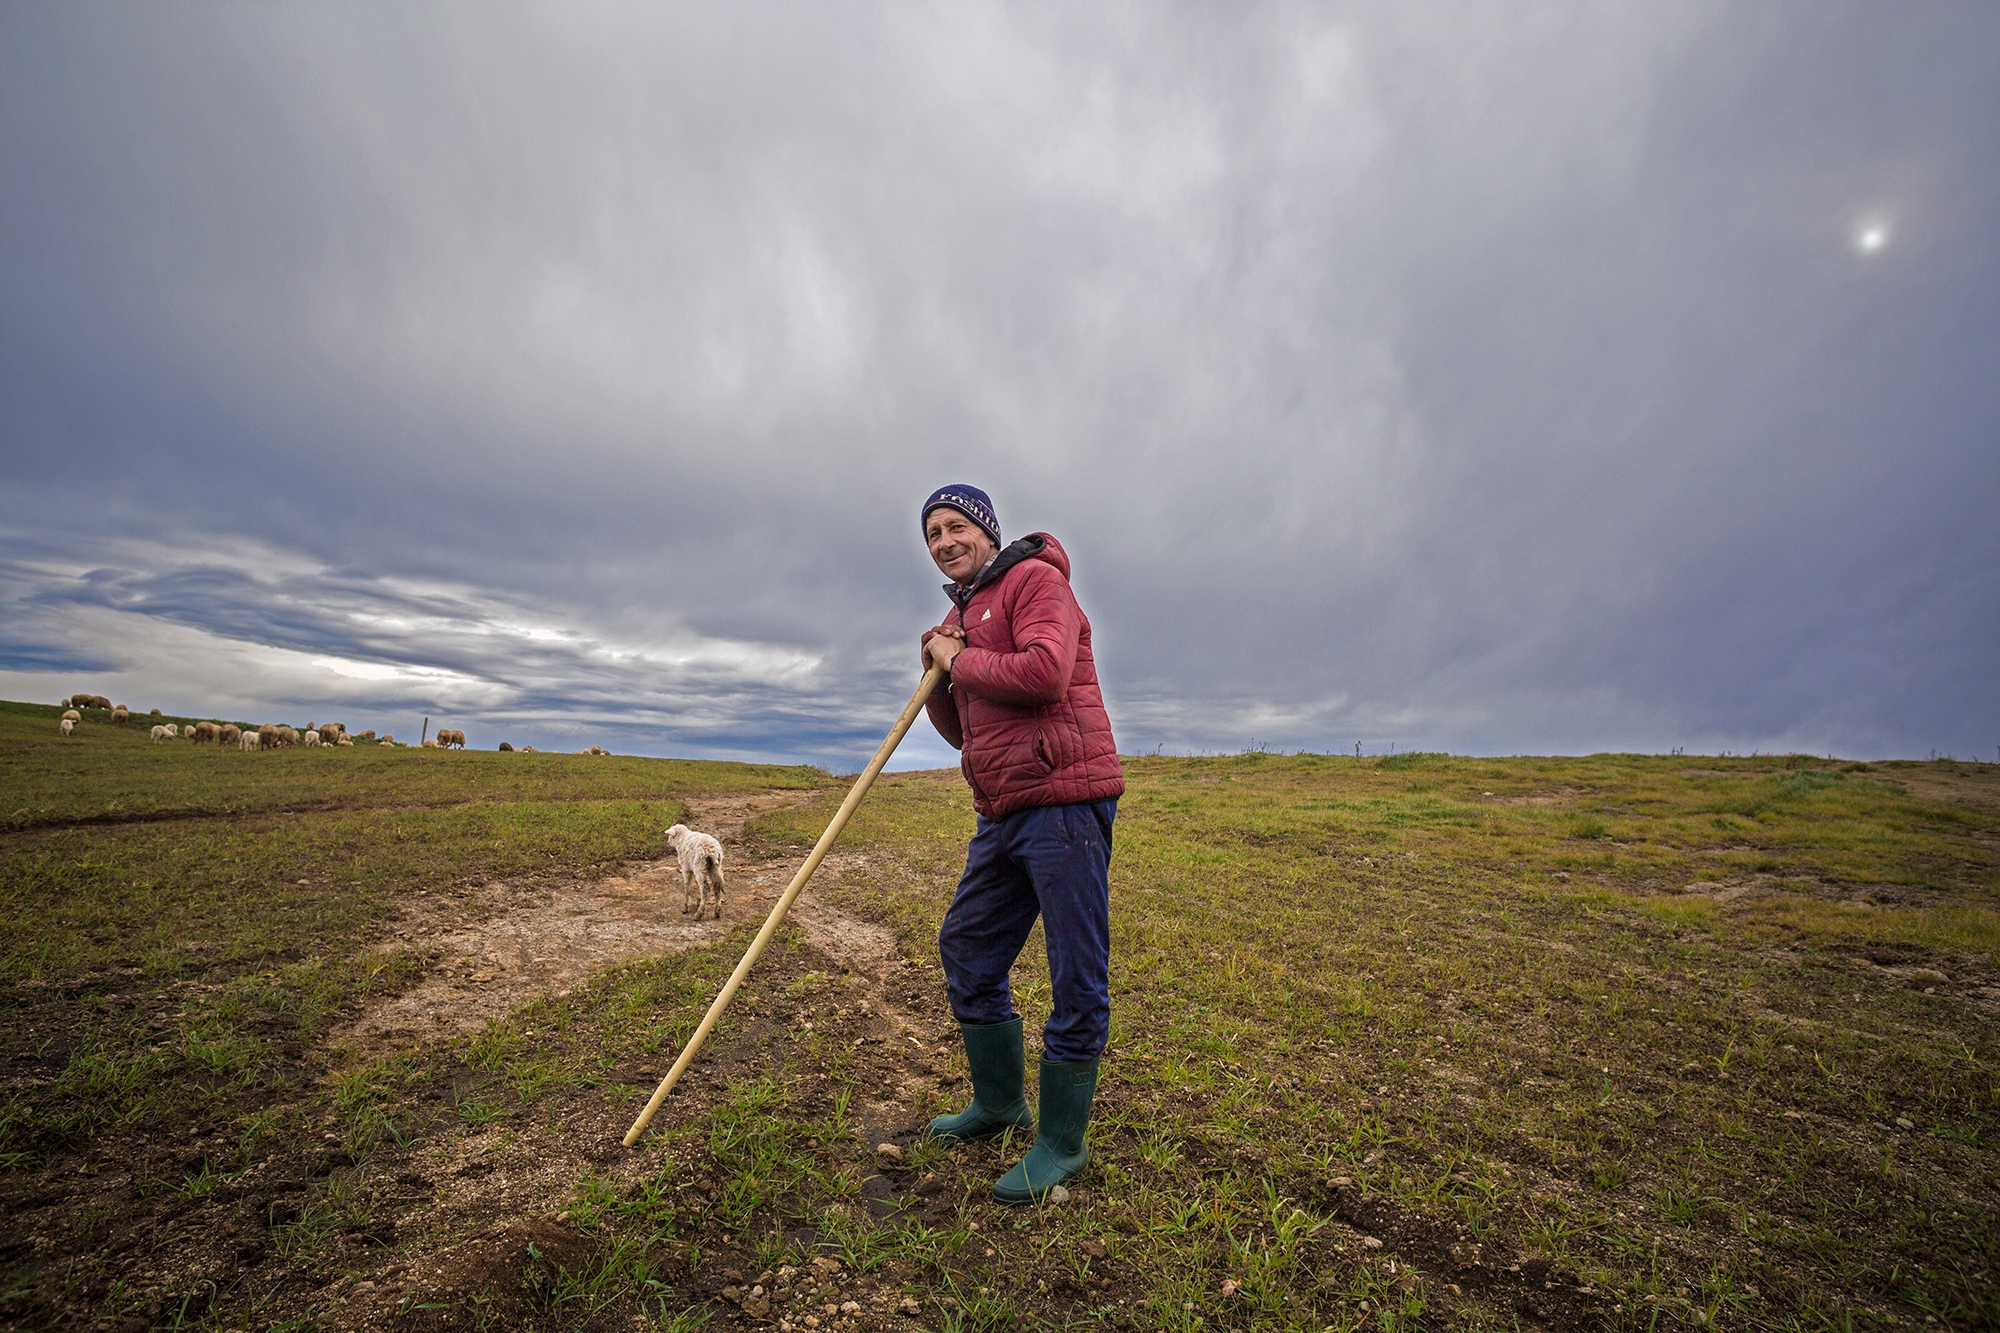 A local shepherd